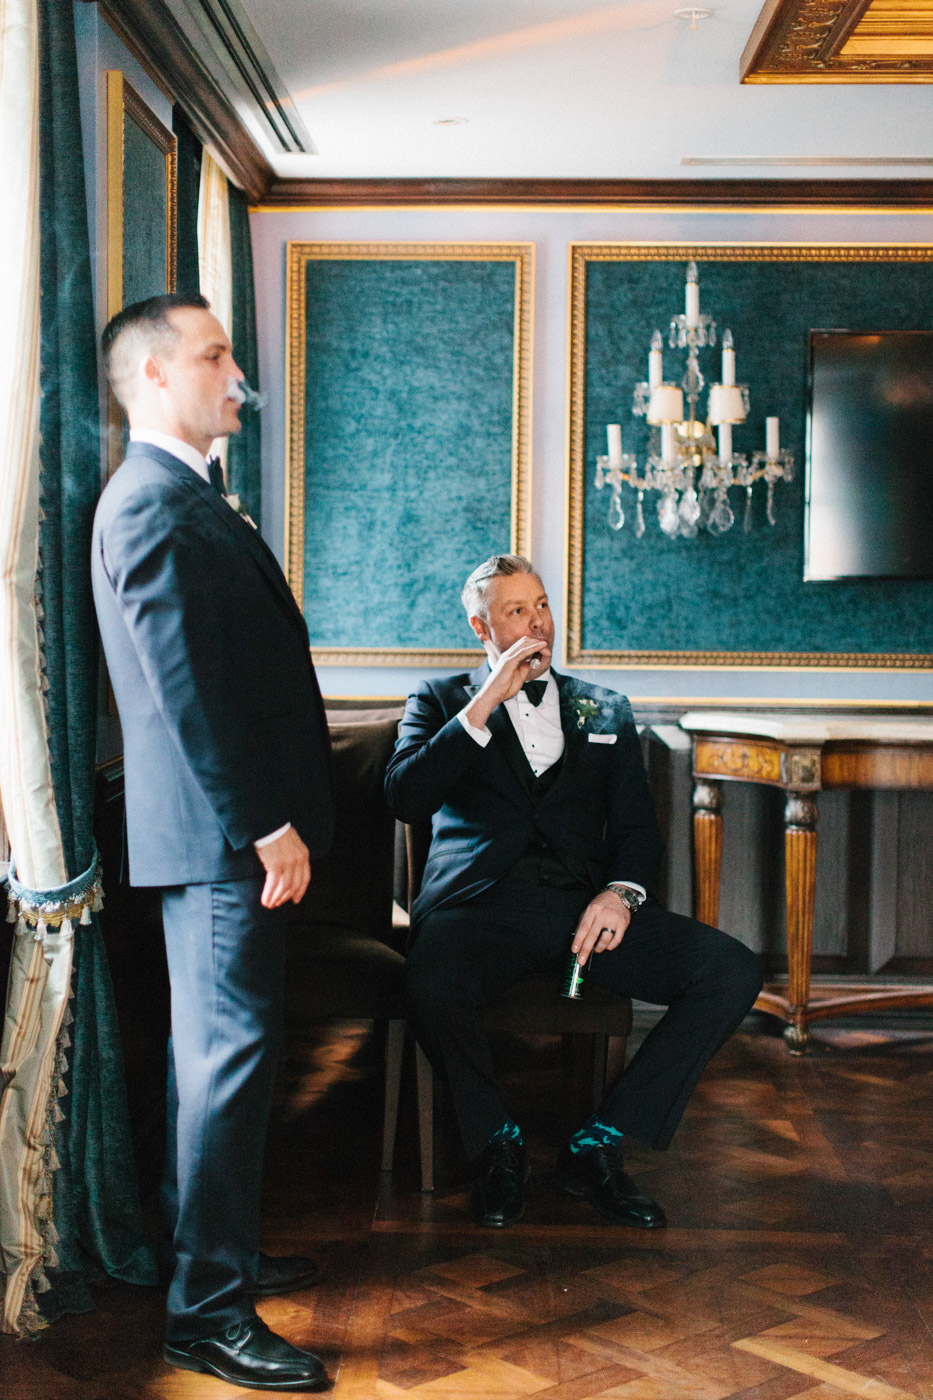 toronto_wedding_photographer_winter_wedding-35.jpg